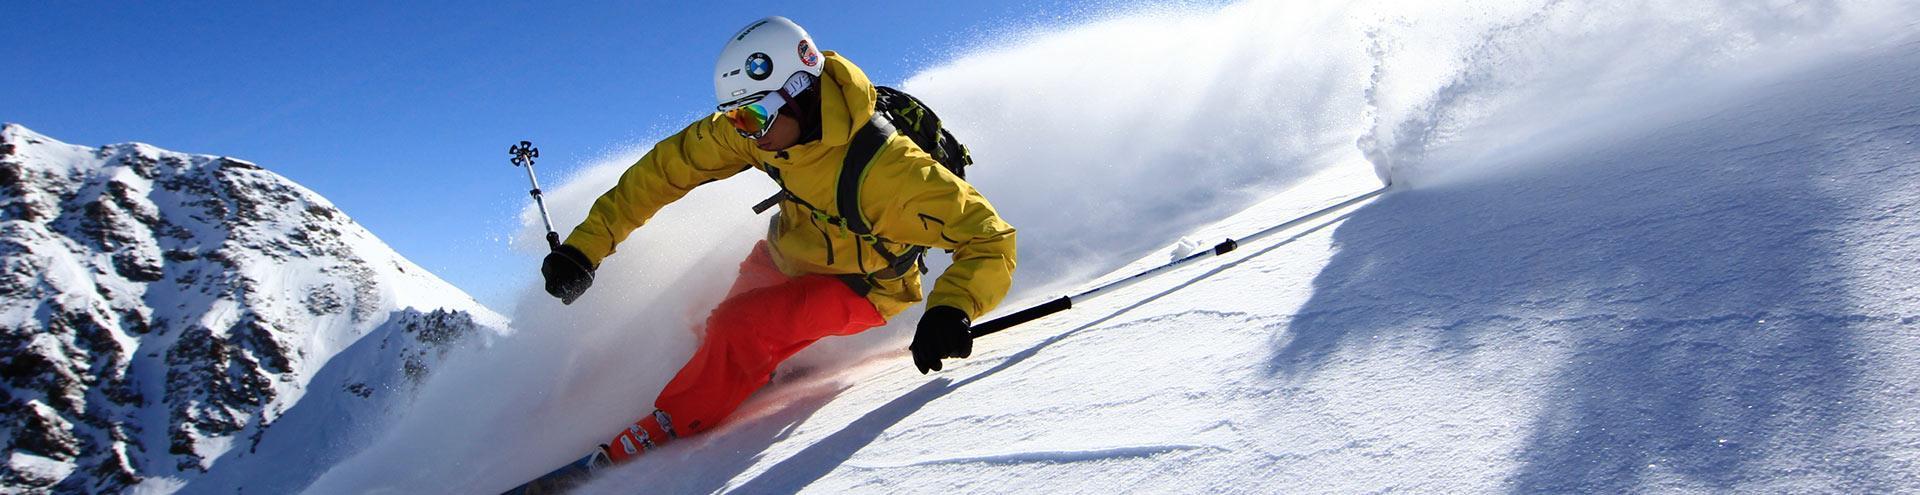 Skiurlaub sulden ideales 4 hotel f r winterferien im for Skiurlaub designhotel